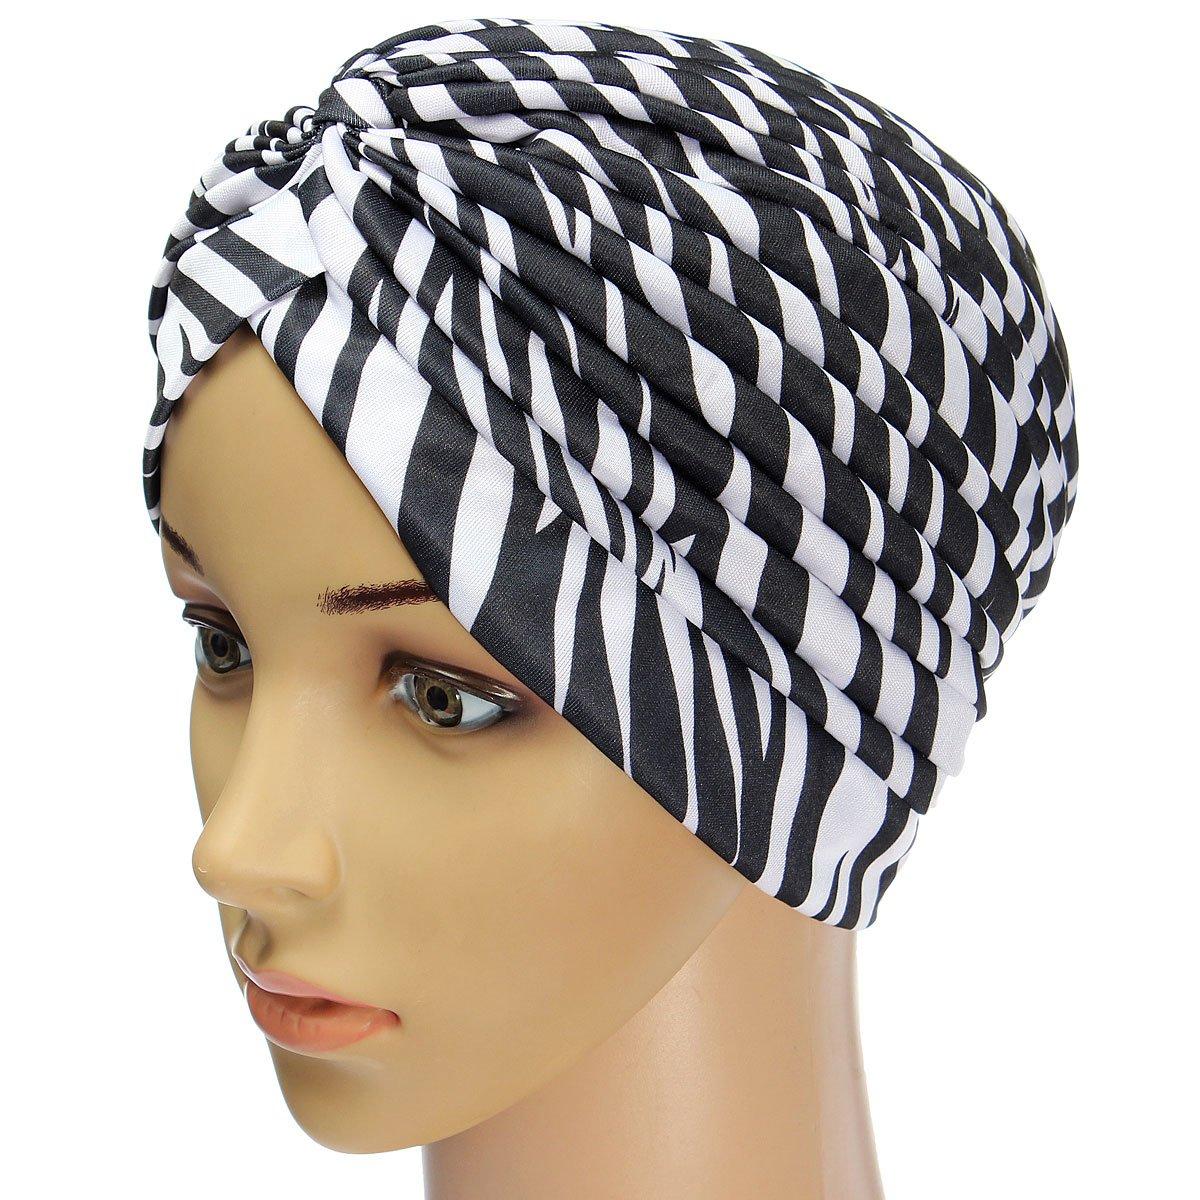 chapeau femme turban. Black Bedroom Furniture Sets. Home Design Ideas